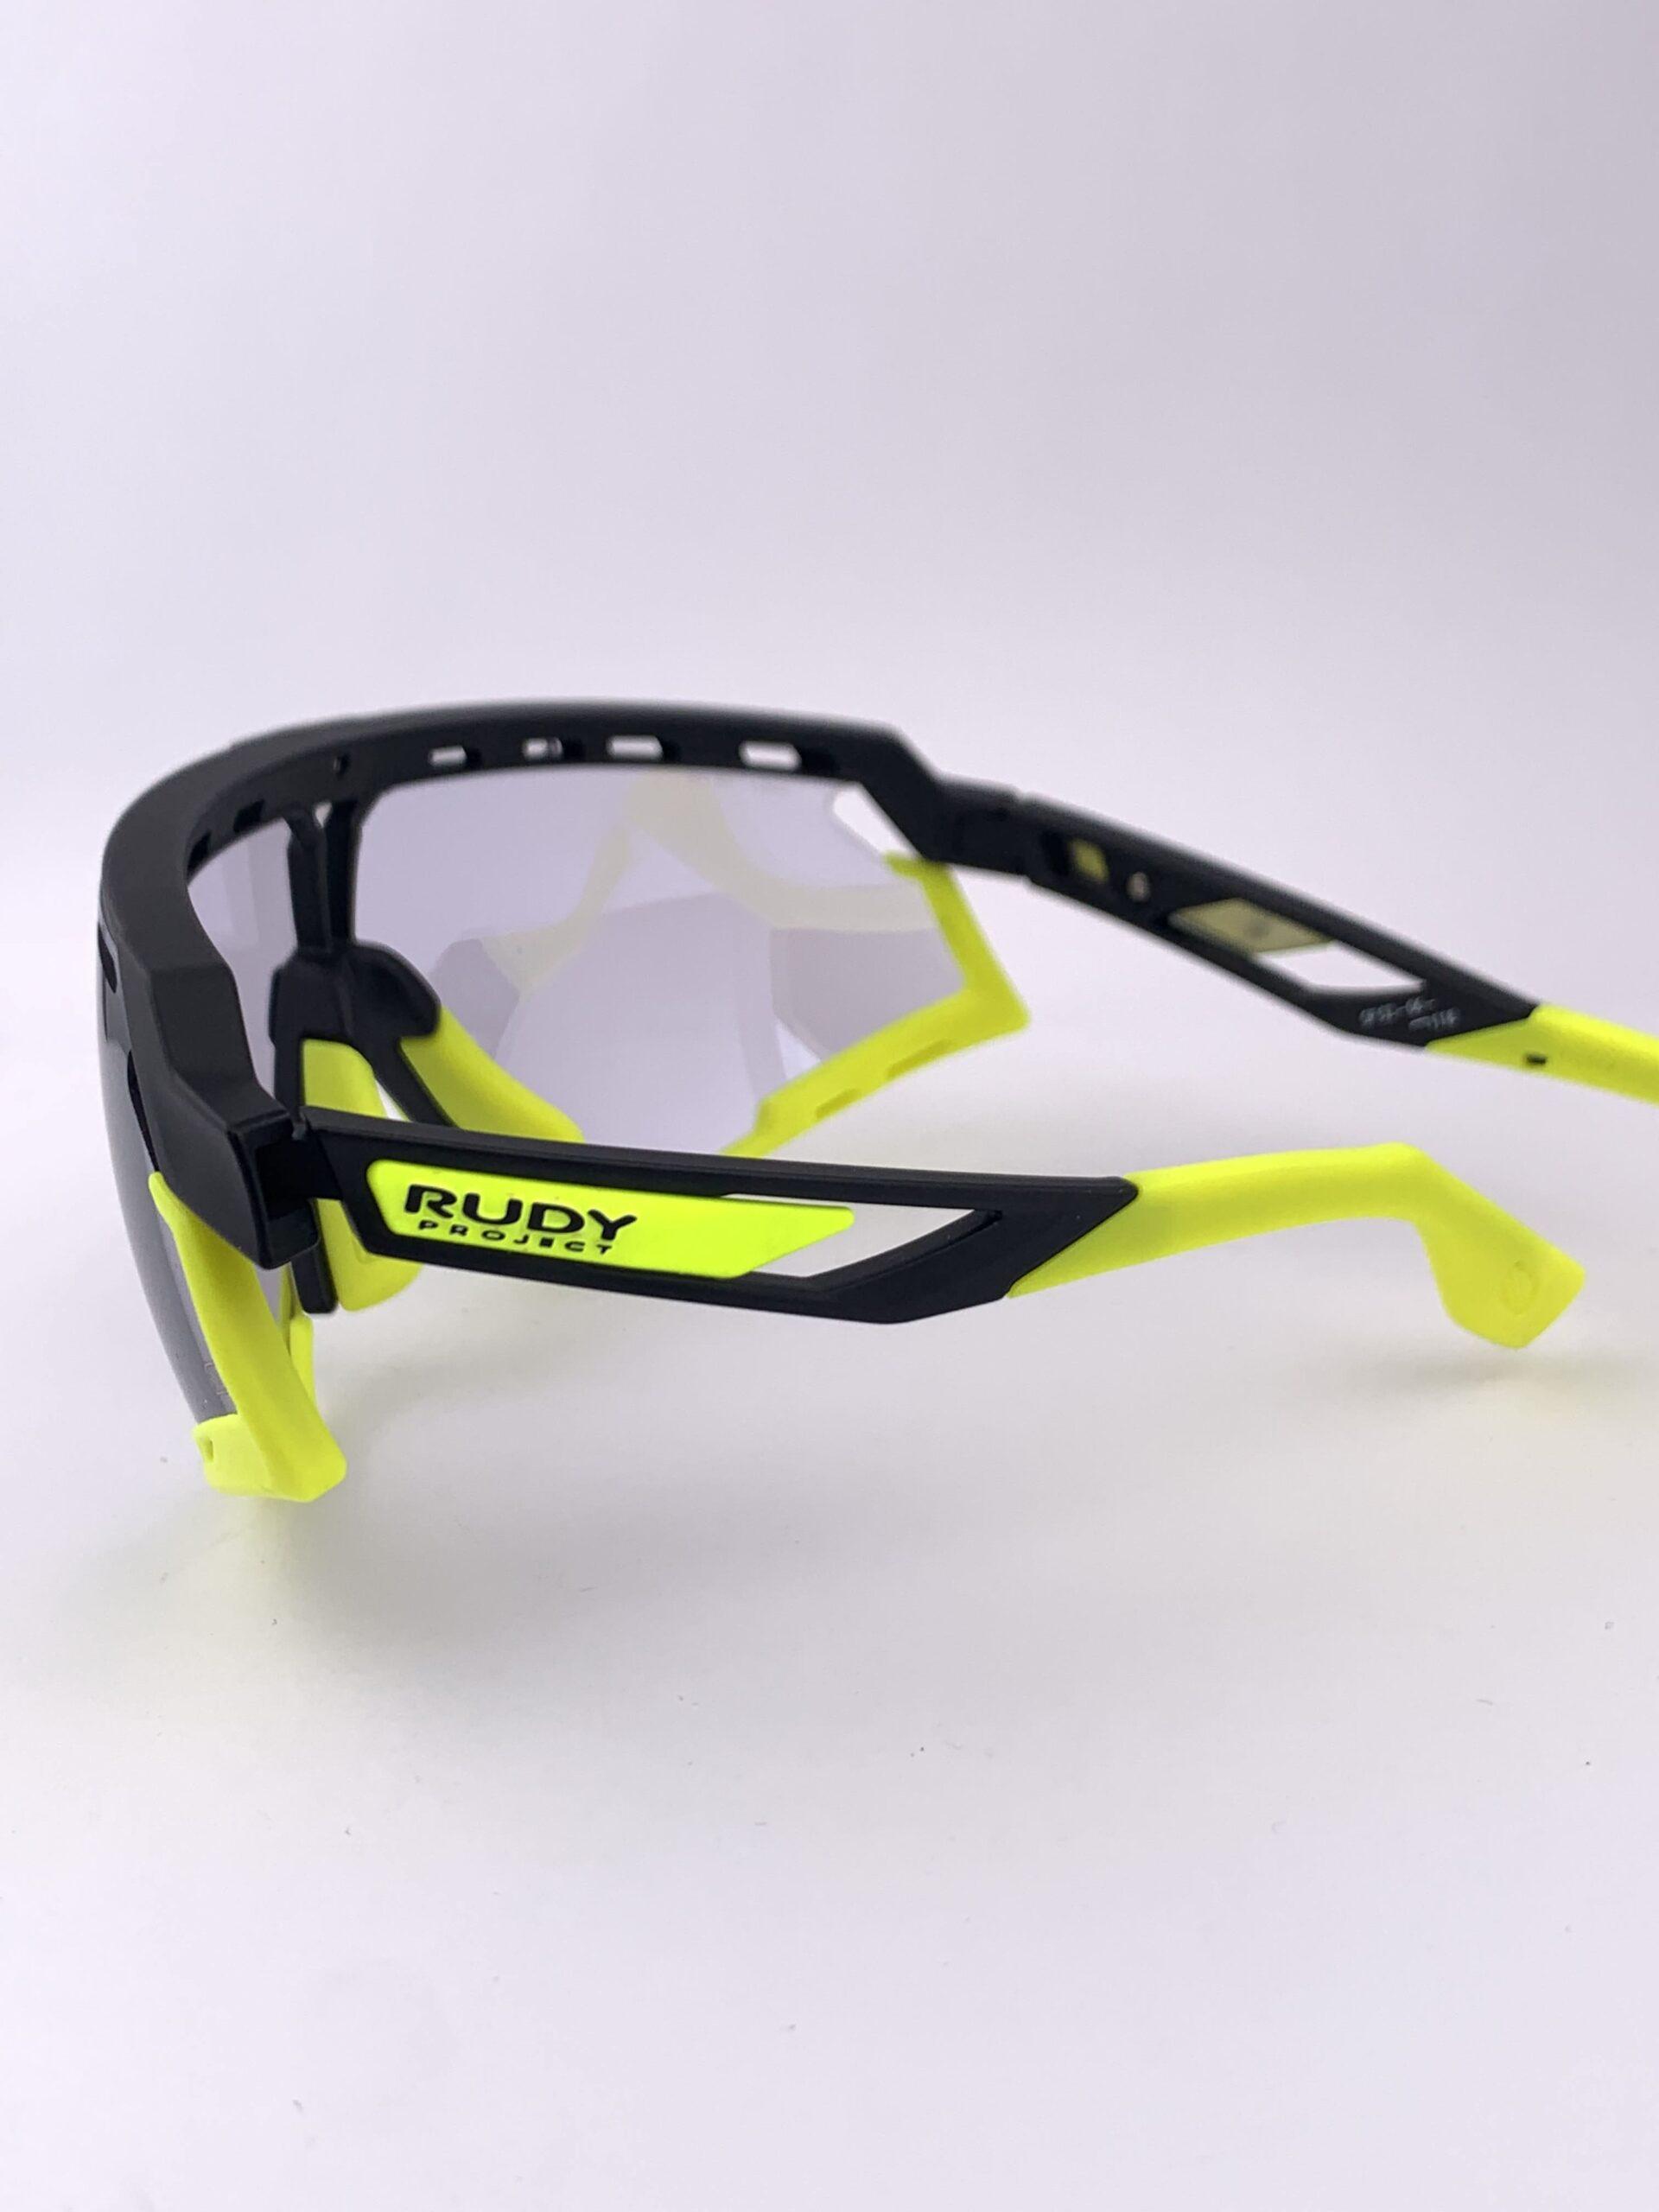 Cyklistické okuliare Defender žlté fluo zozadu